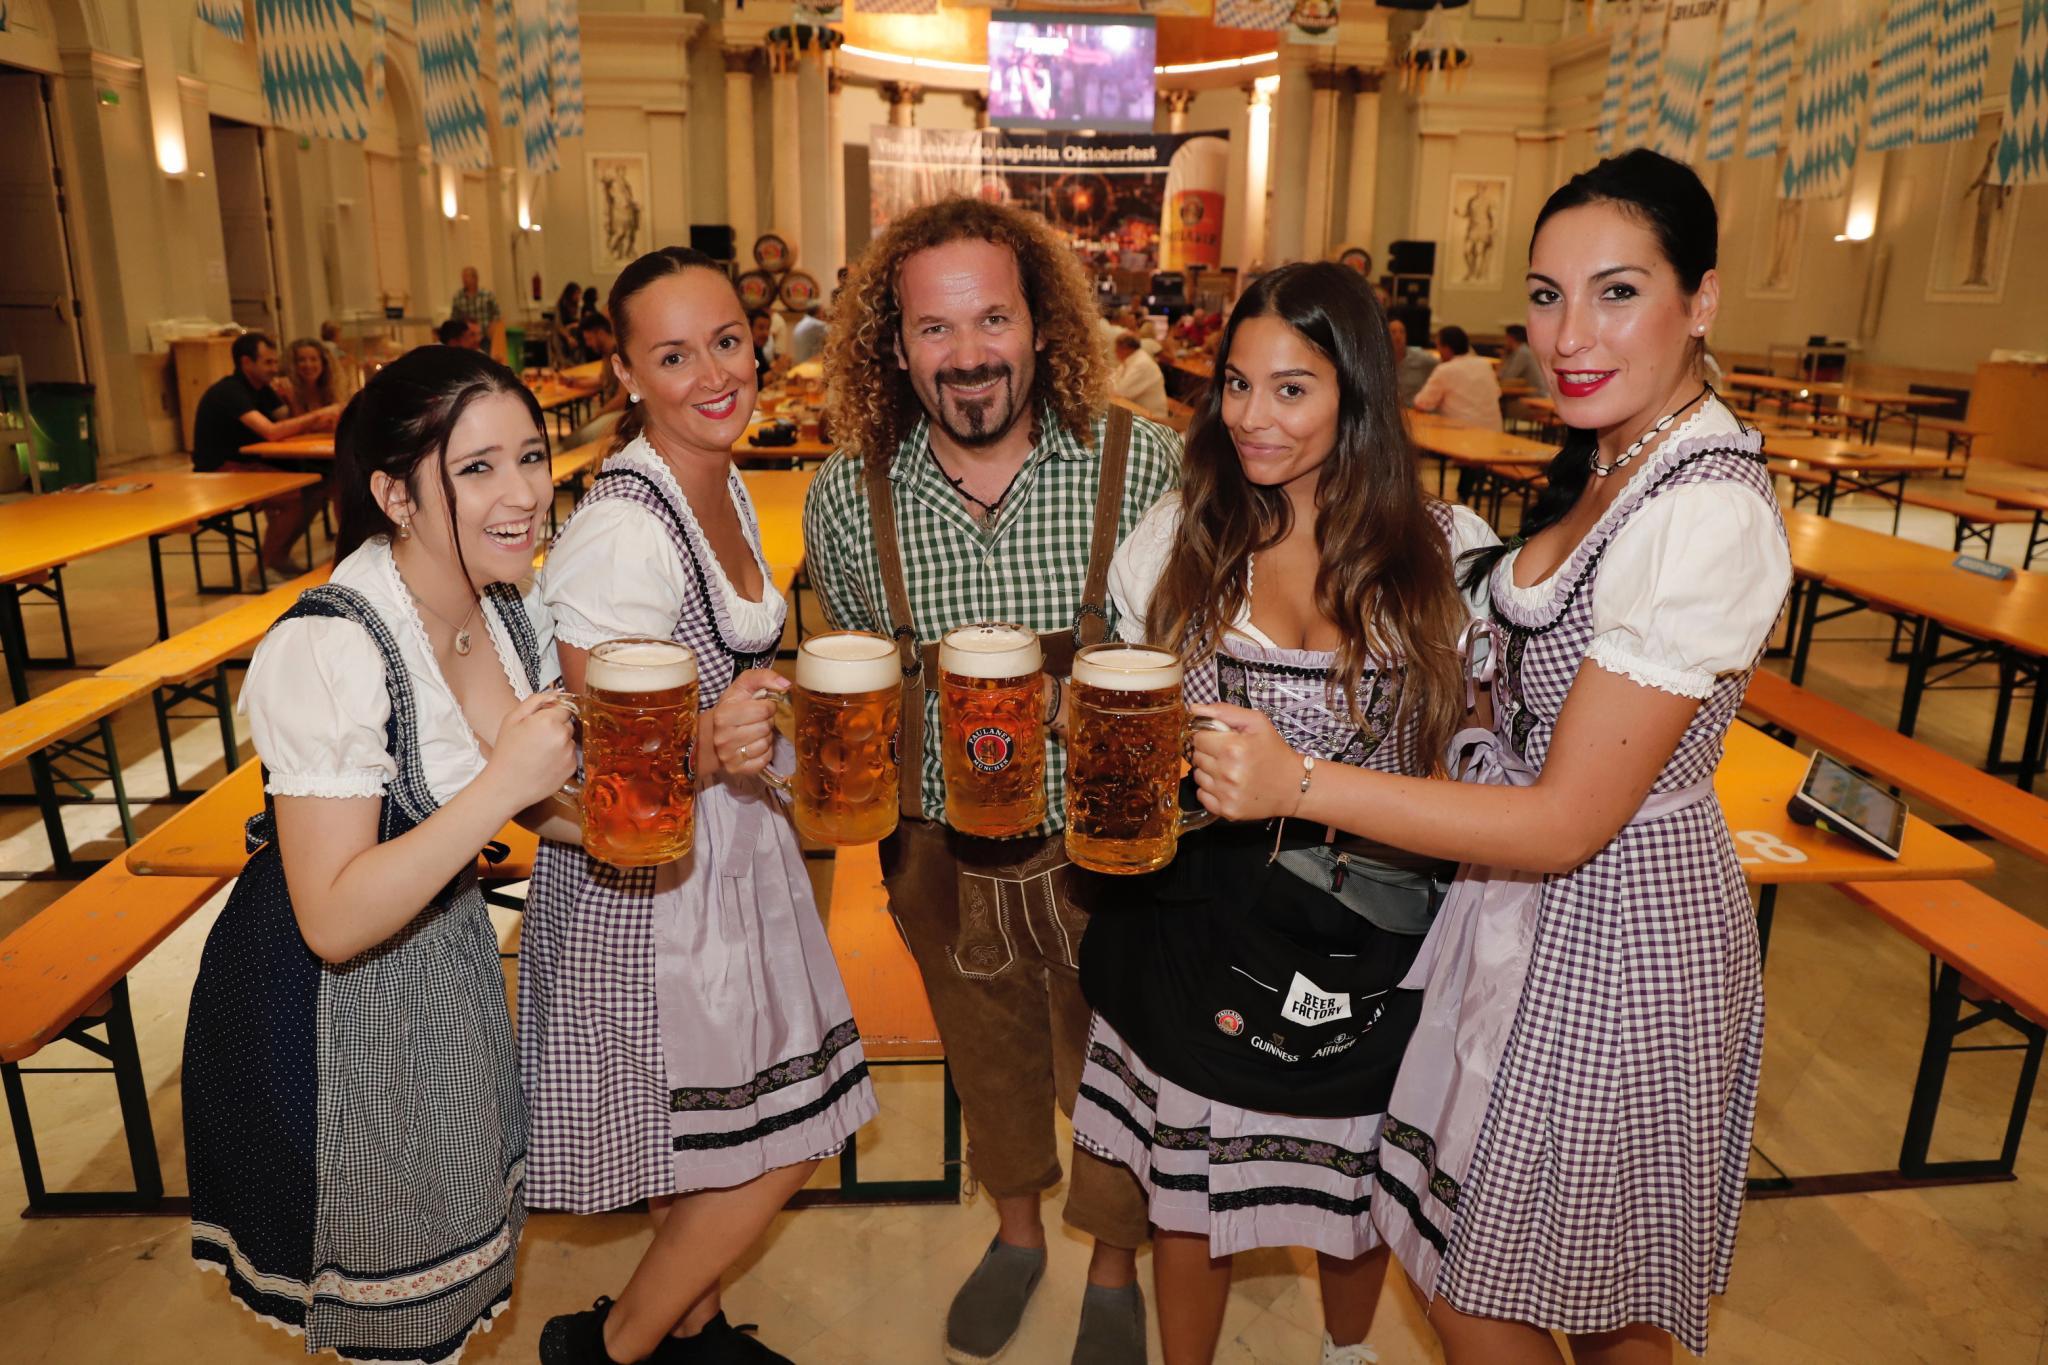 PALMA. FERIAS. Arranca la Oktoberfest de Palma. El Pueblo Español acoge la popular fiesta alemana